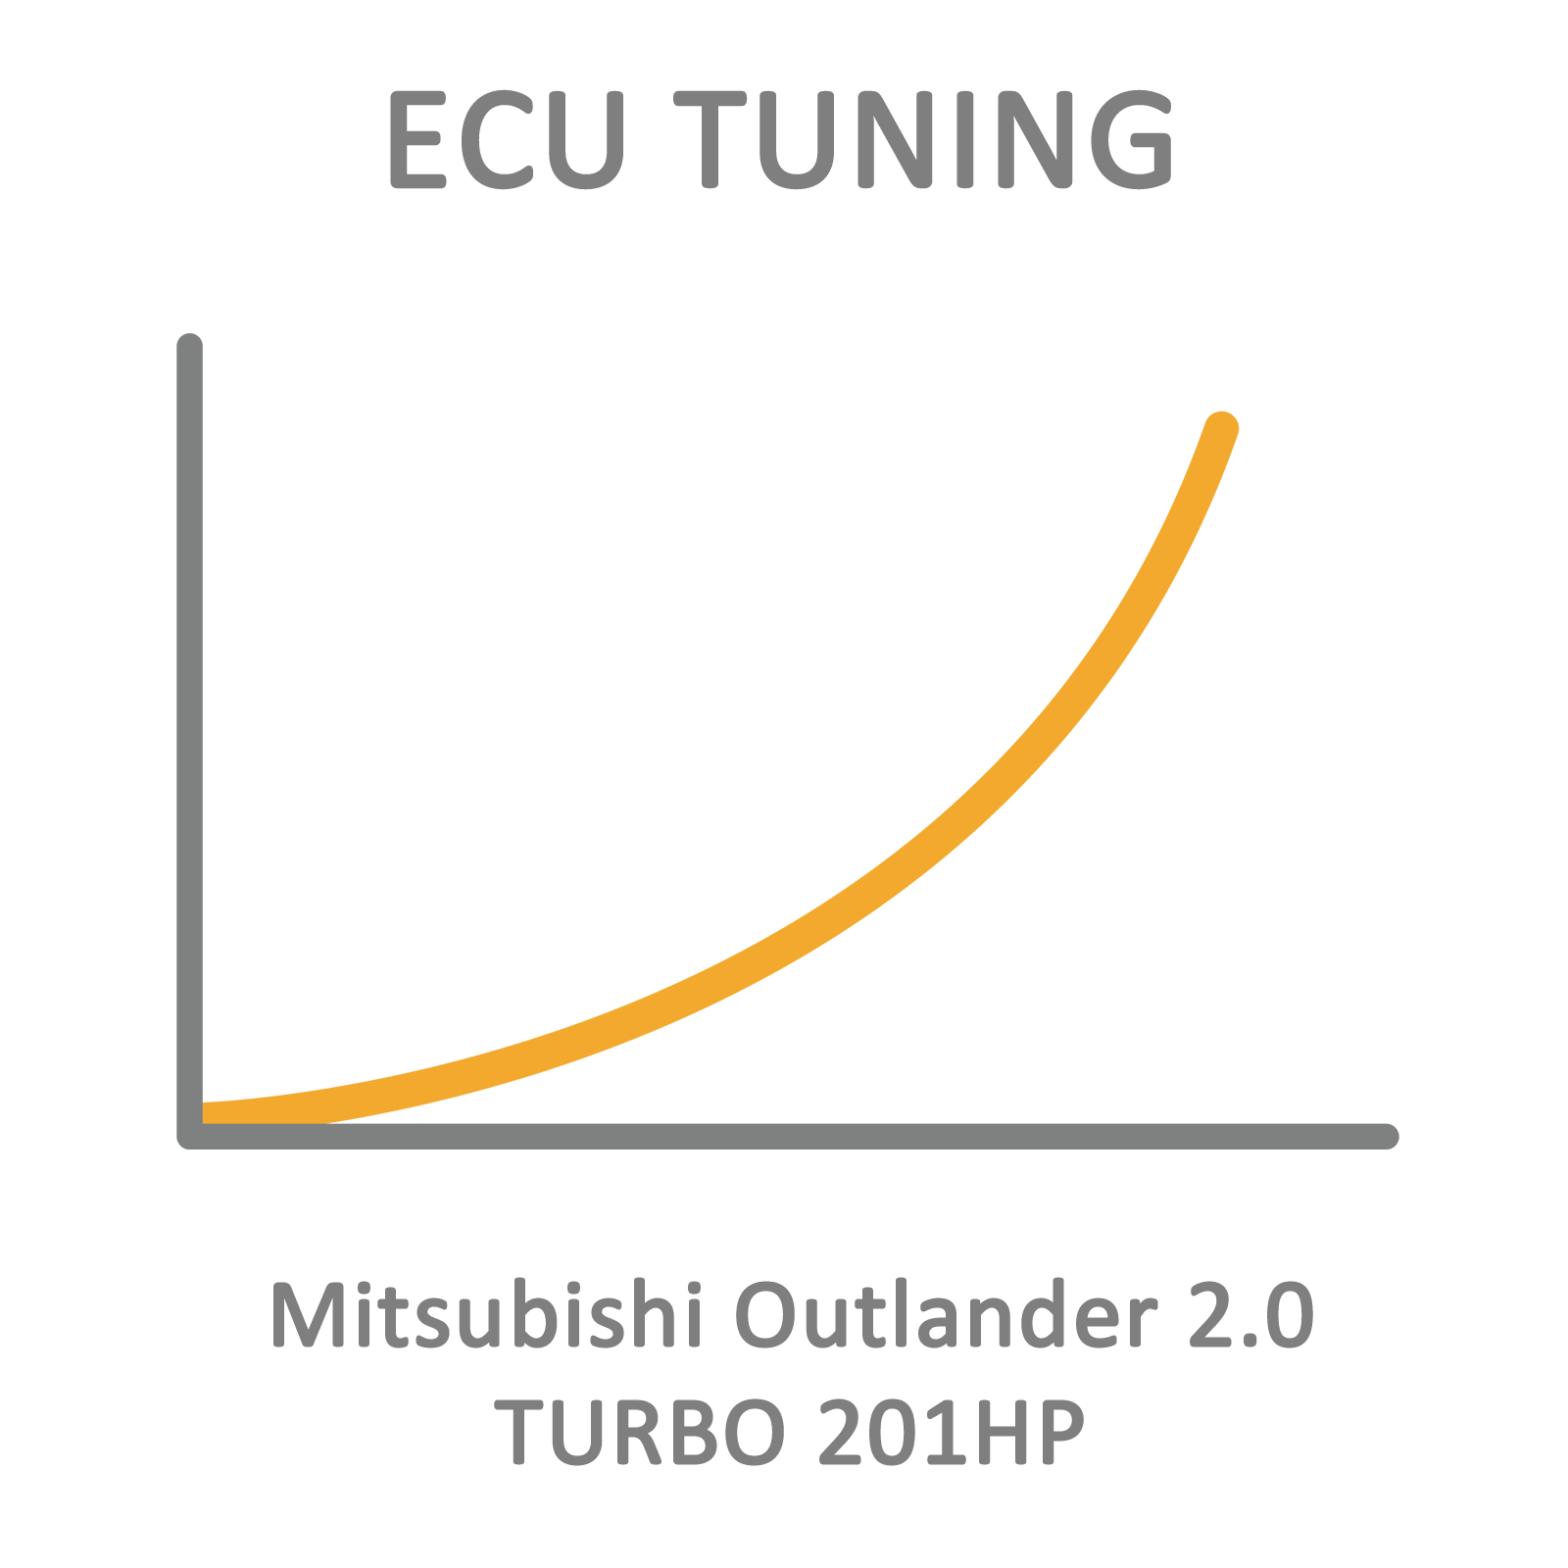 Mitsubishi Outlander 2.0 TURBO 201HP ECU Tuning Remapping